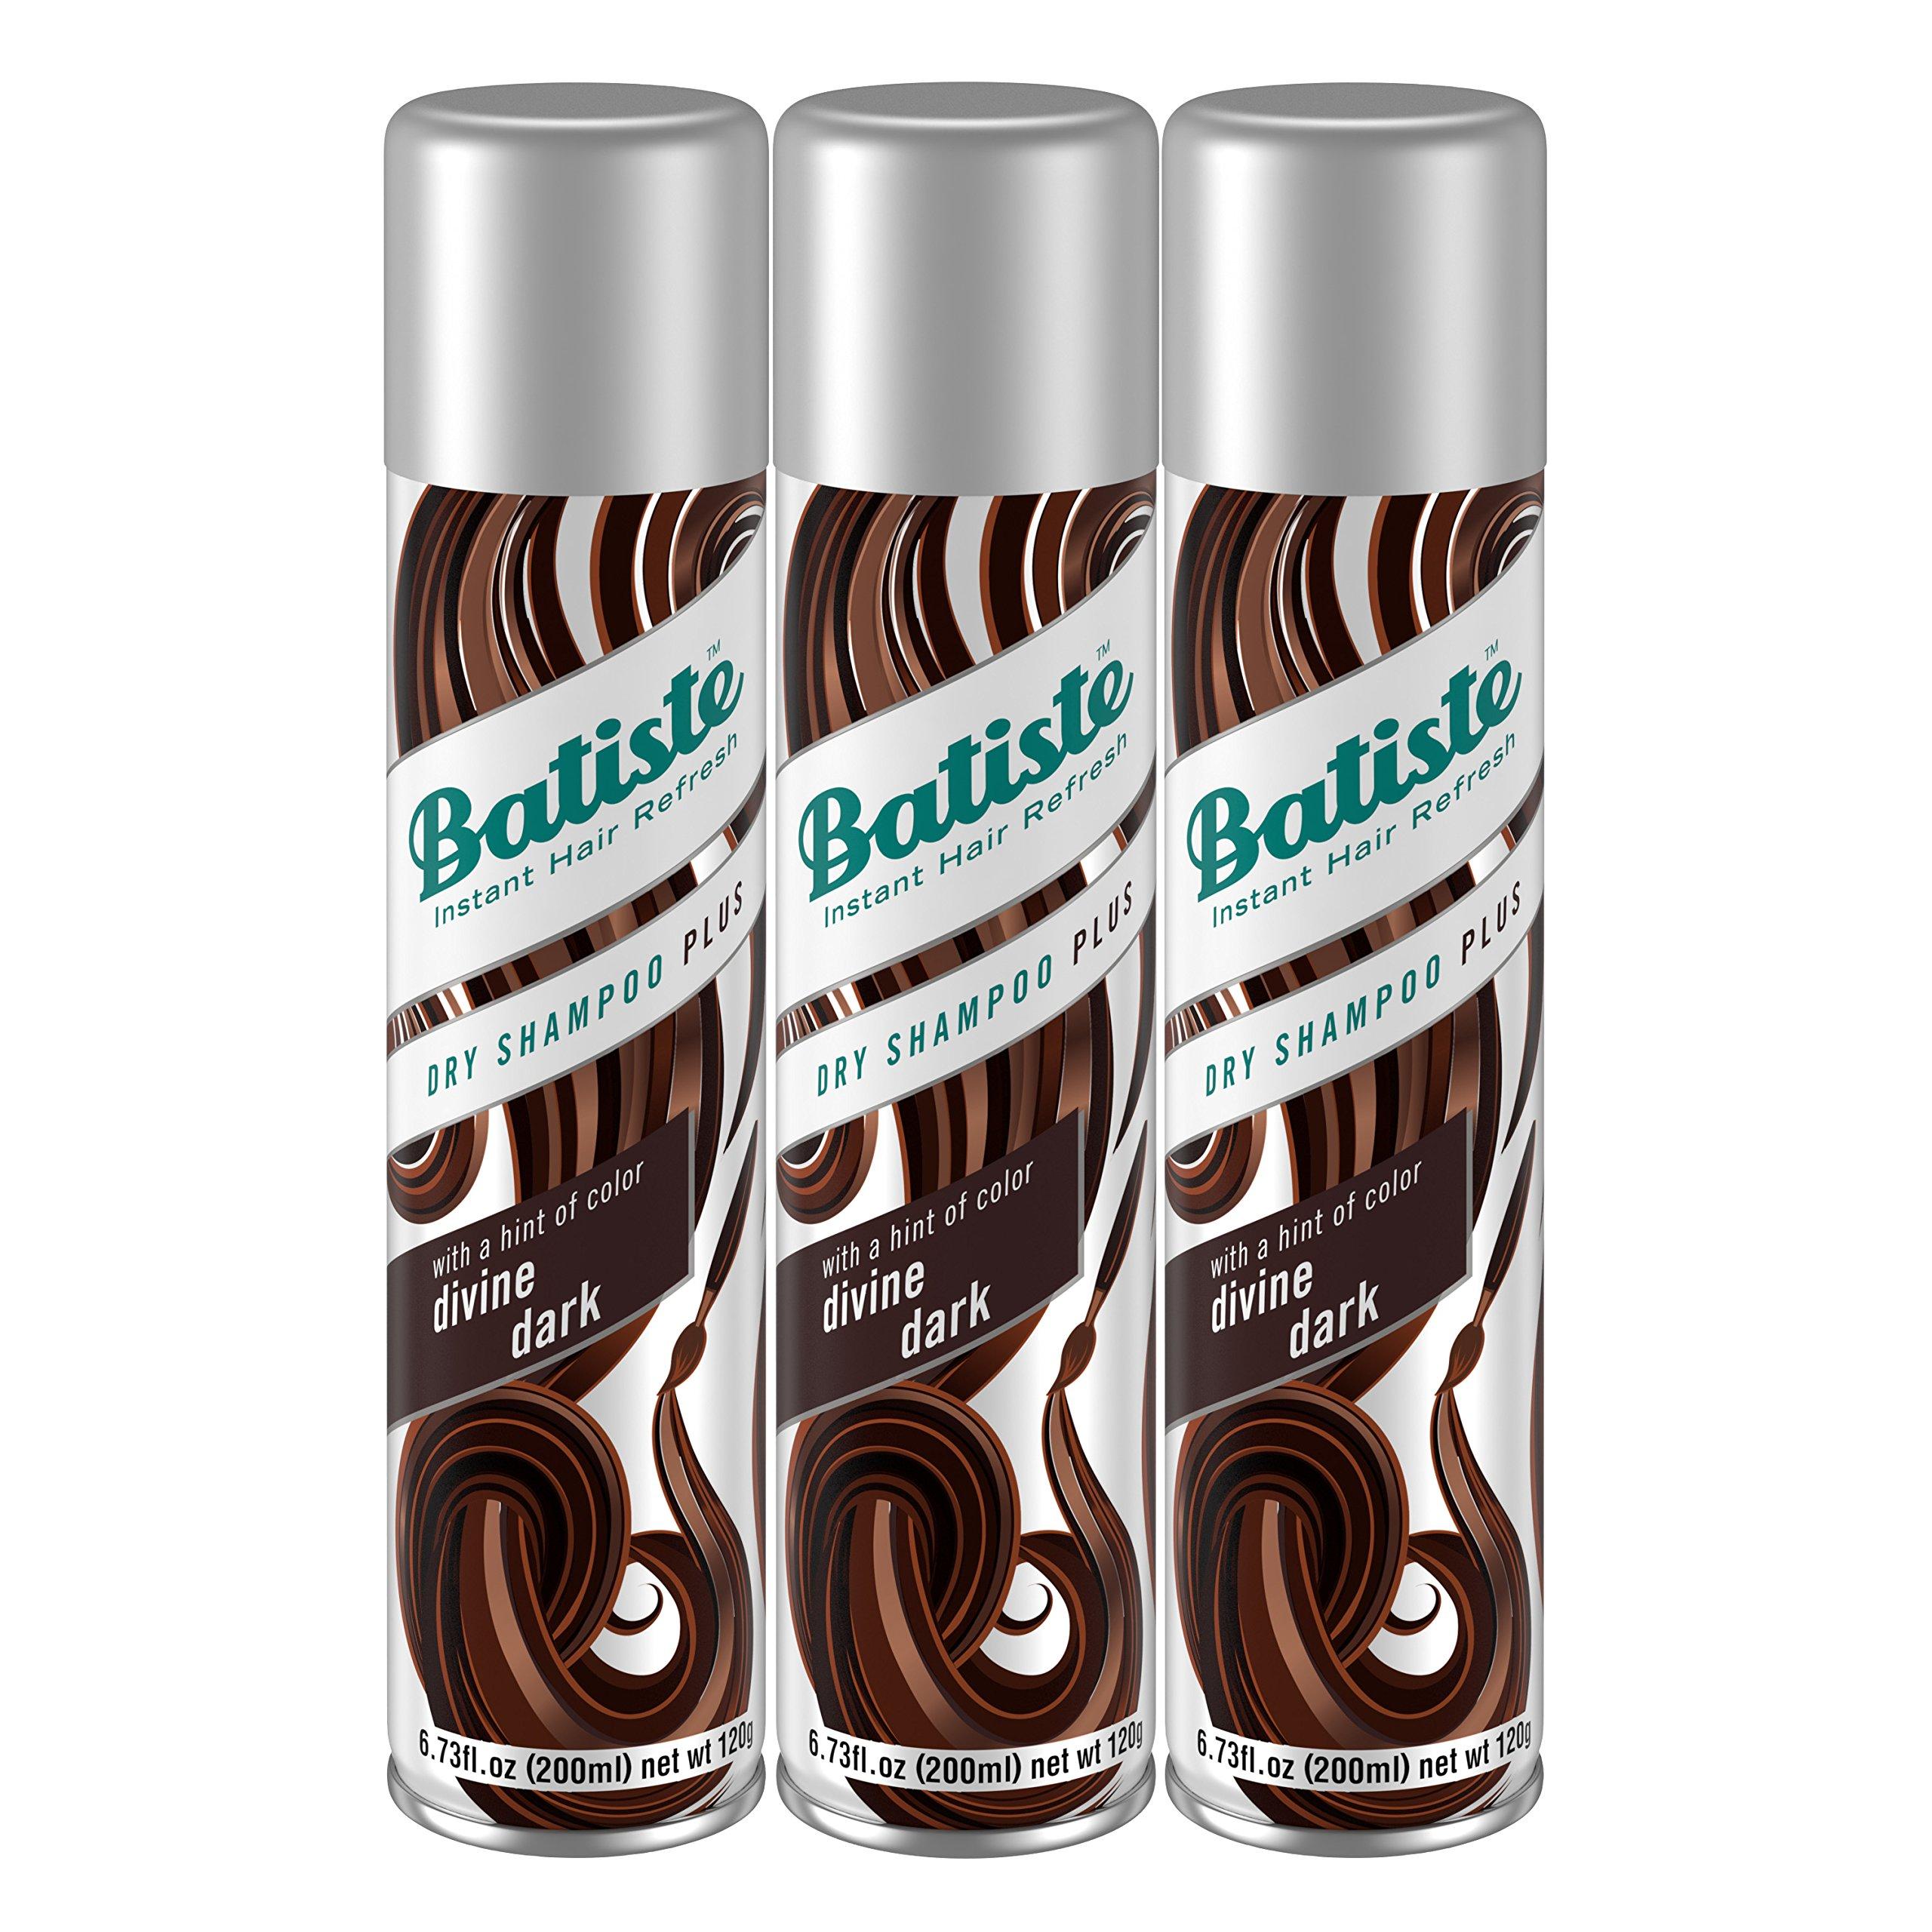 Amazon.com: Batiste Dry Shampoo, Dark & Deep Brown 6.73